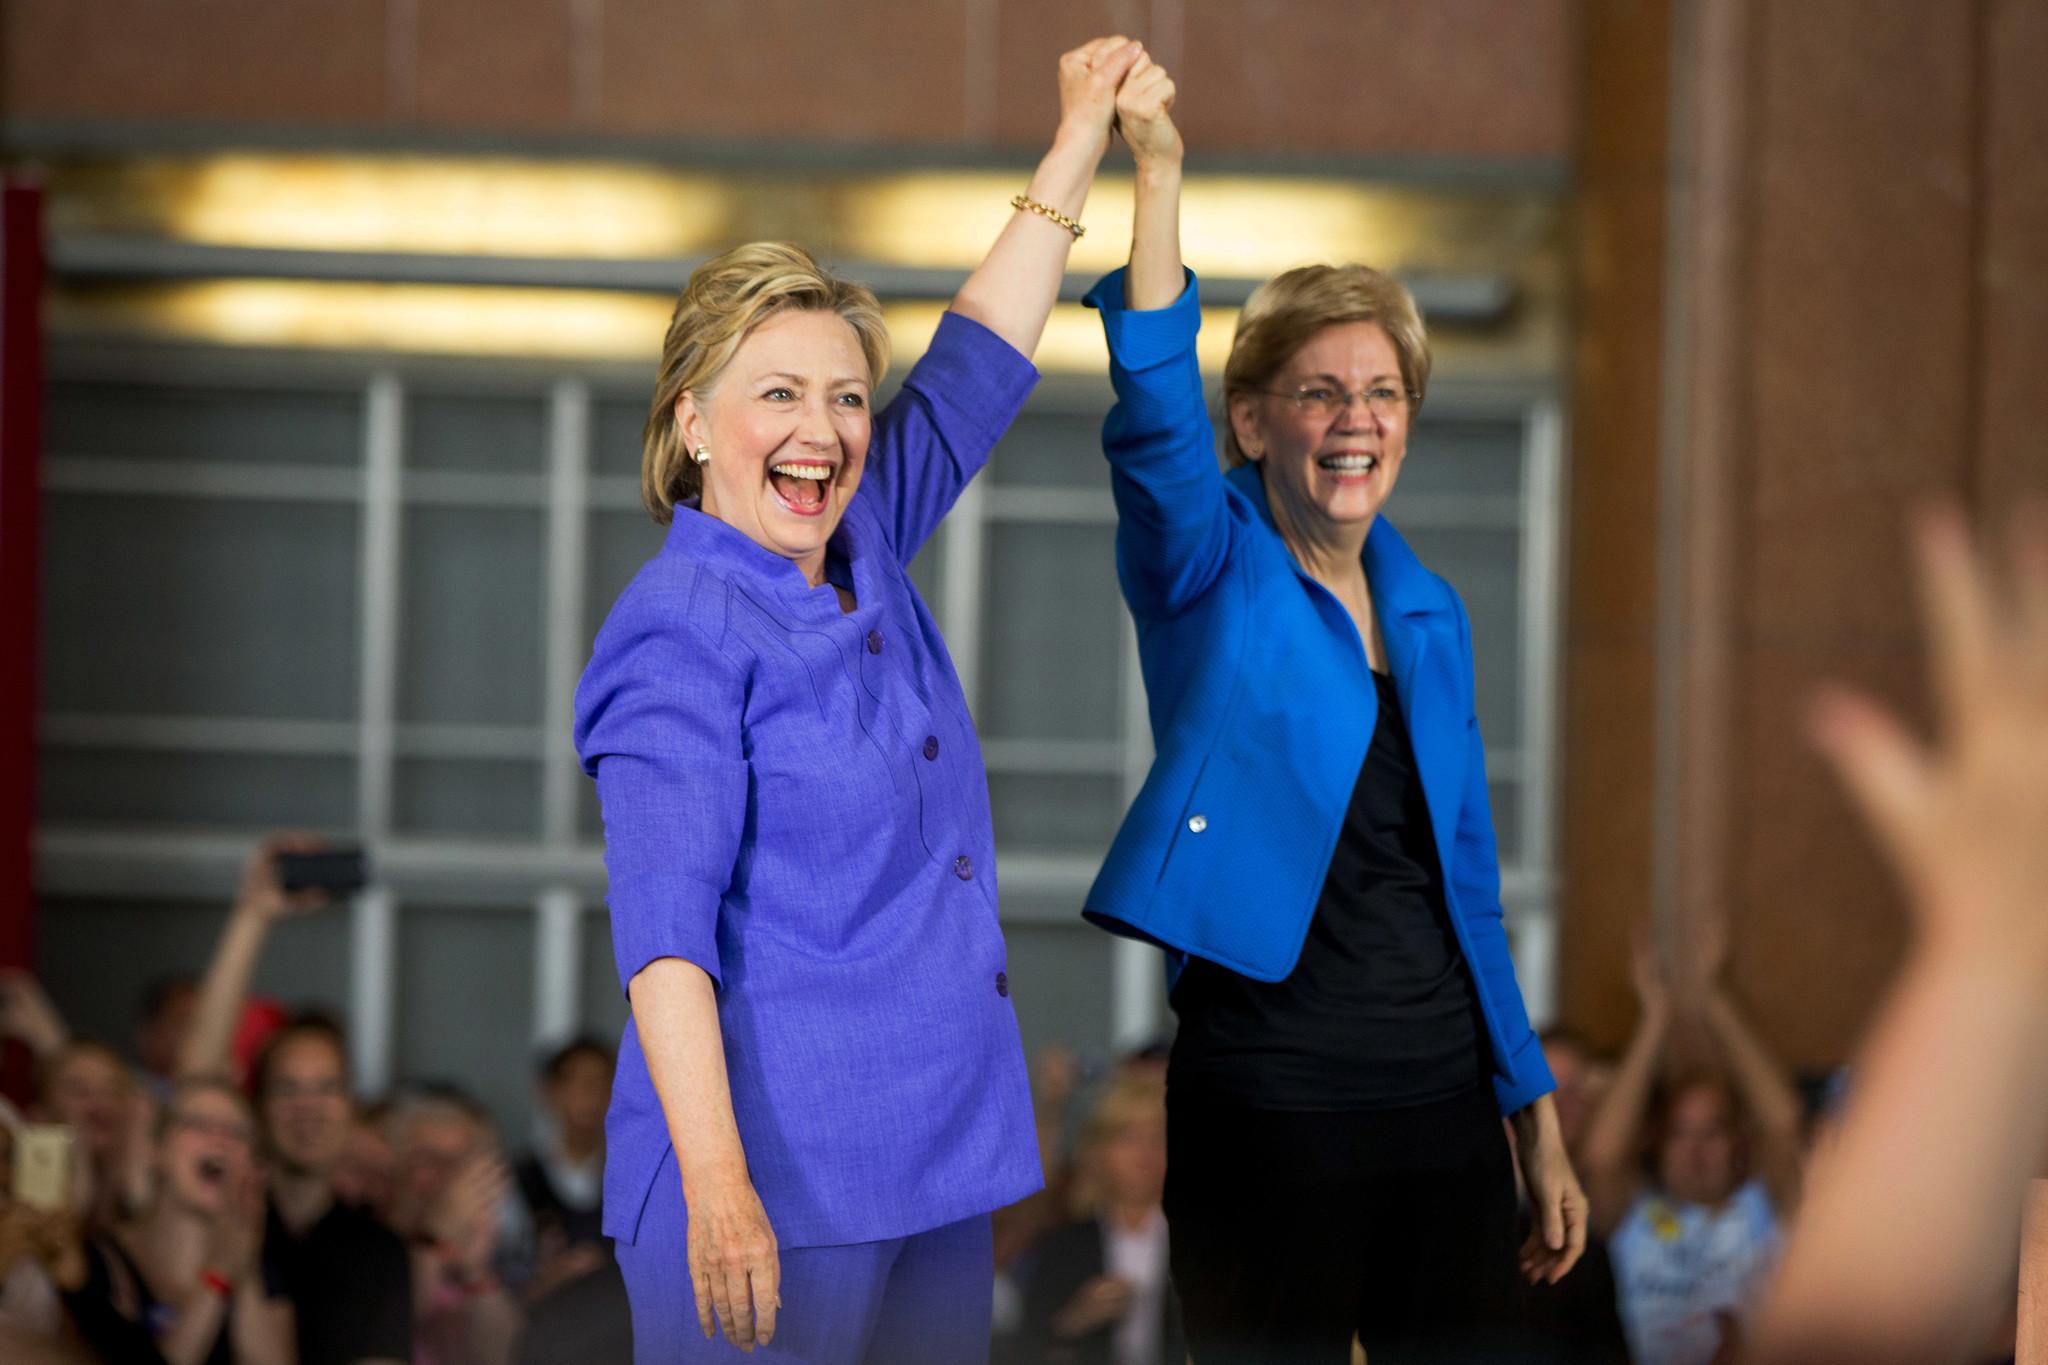 Hillary Clinton, Elizabeth Warren meet for 1st campaign event